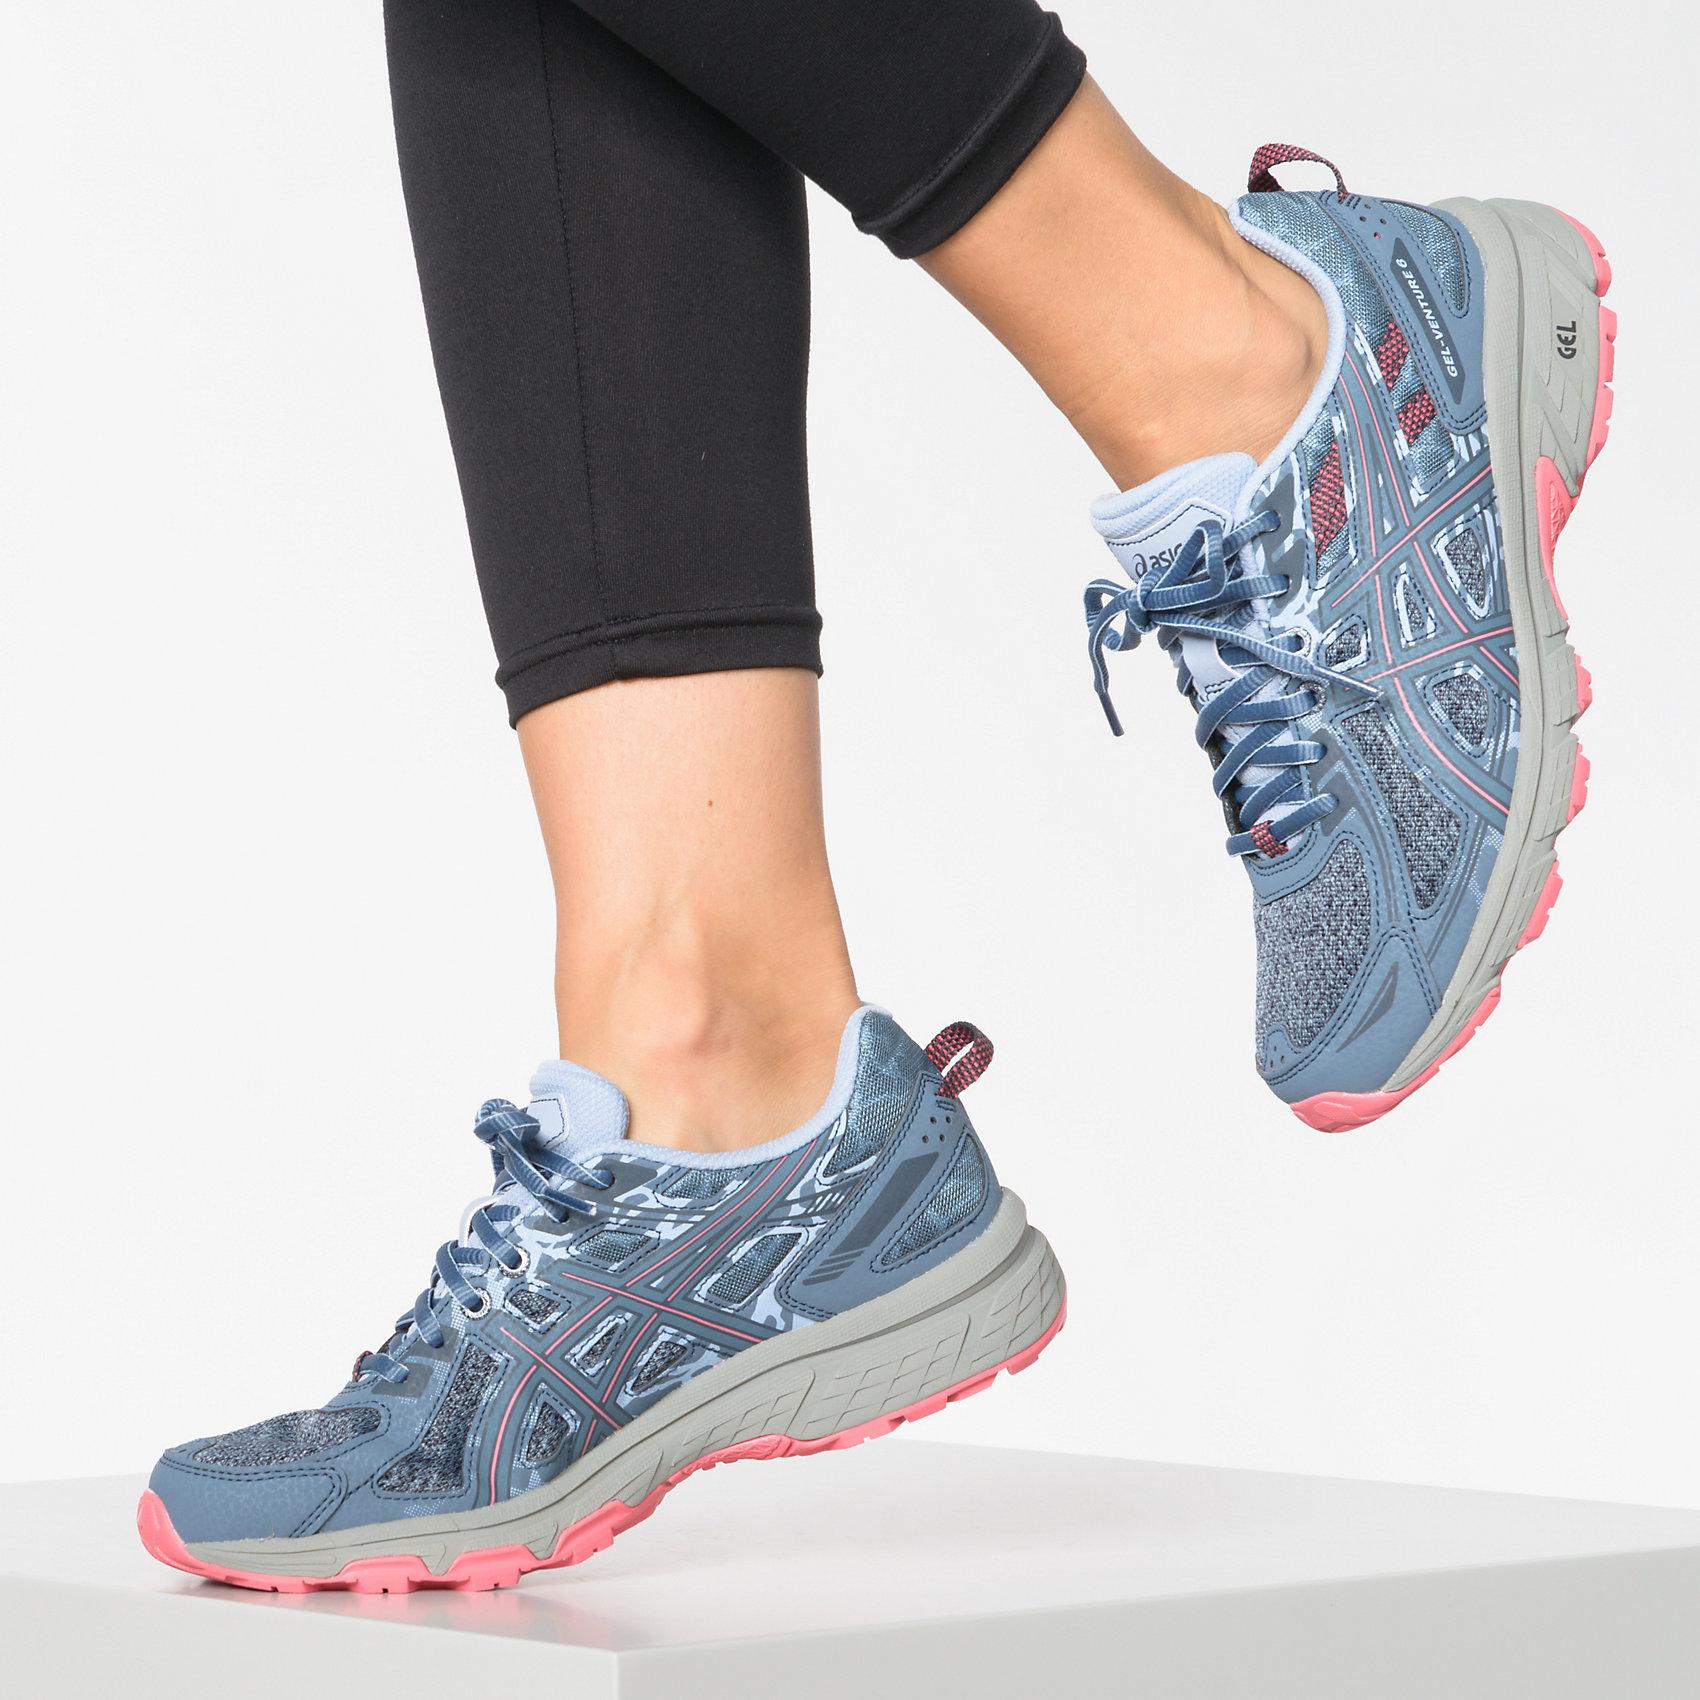 Neu ASICS GEL-VENTURE 6 Trailrunningschuhe Trailrunningschuhe Trailrunningschuhe 10753224 für Damen blau fff4a9